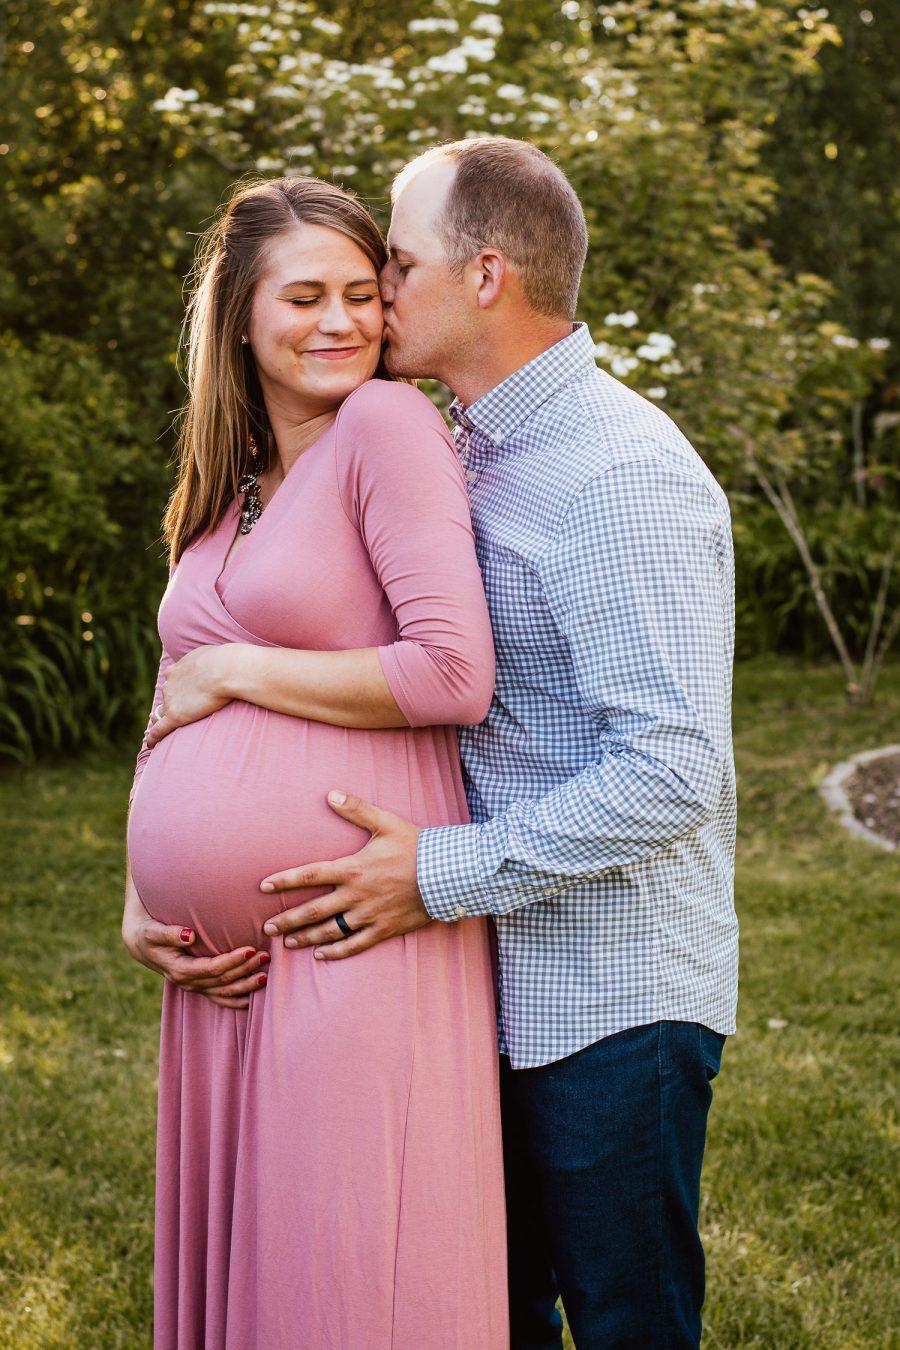 Maternity photographer in Appleton by daphodil photo & film